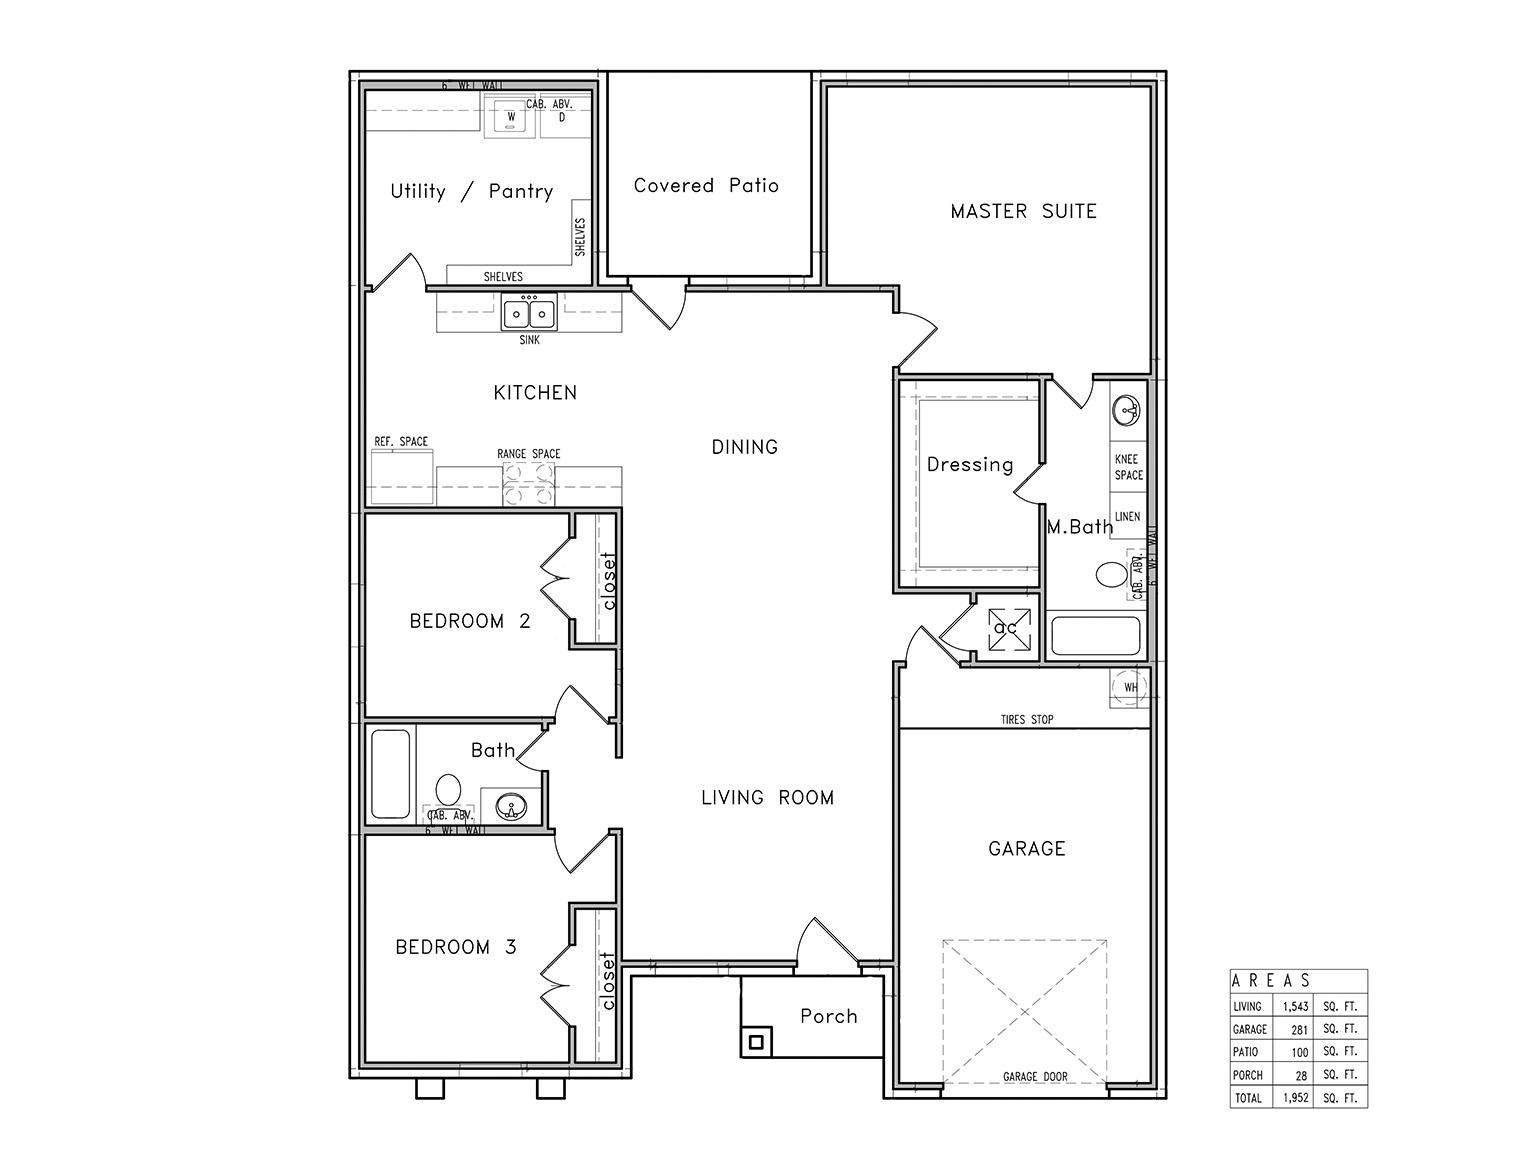 Model 1543 Plan, Primera Grove, Harlingen